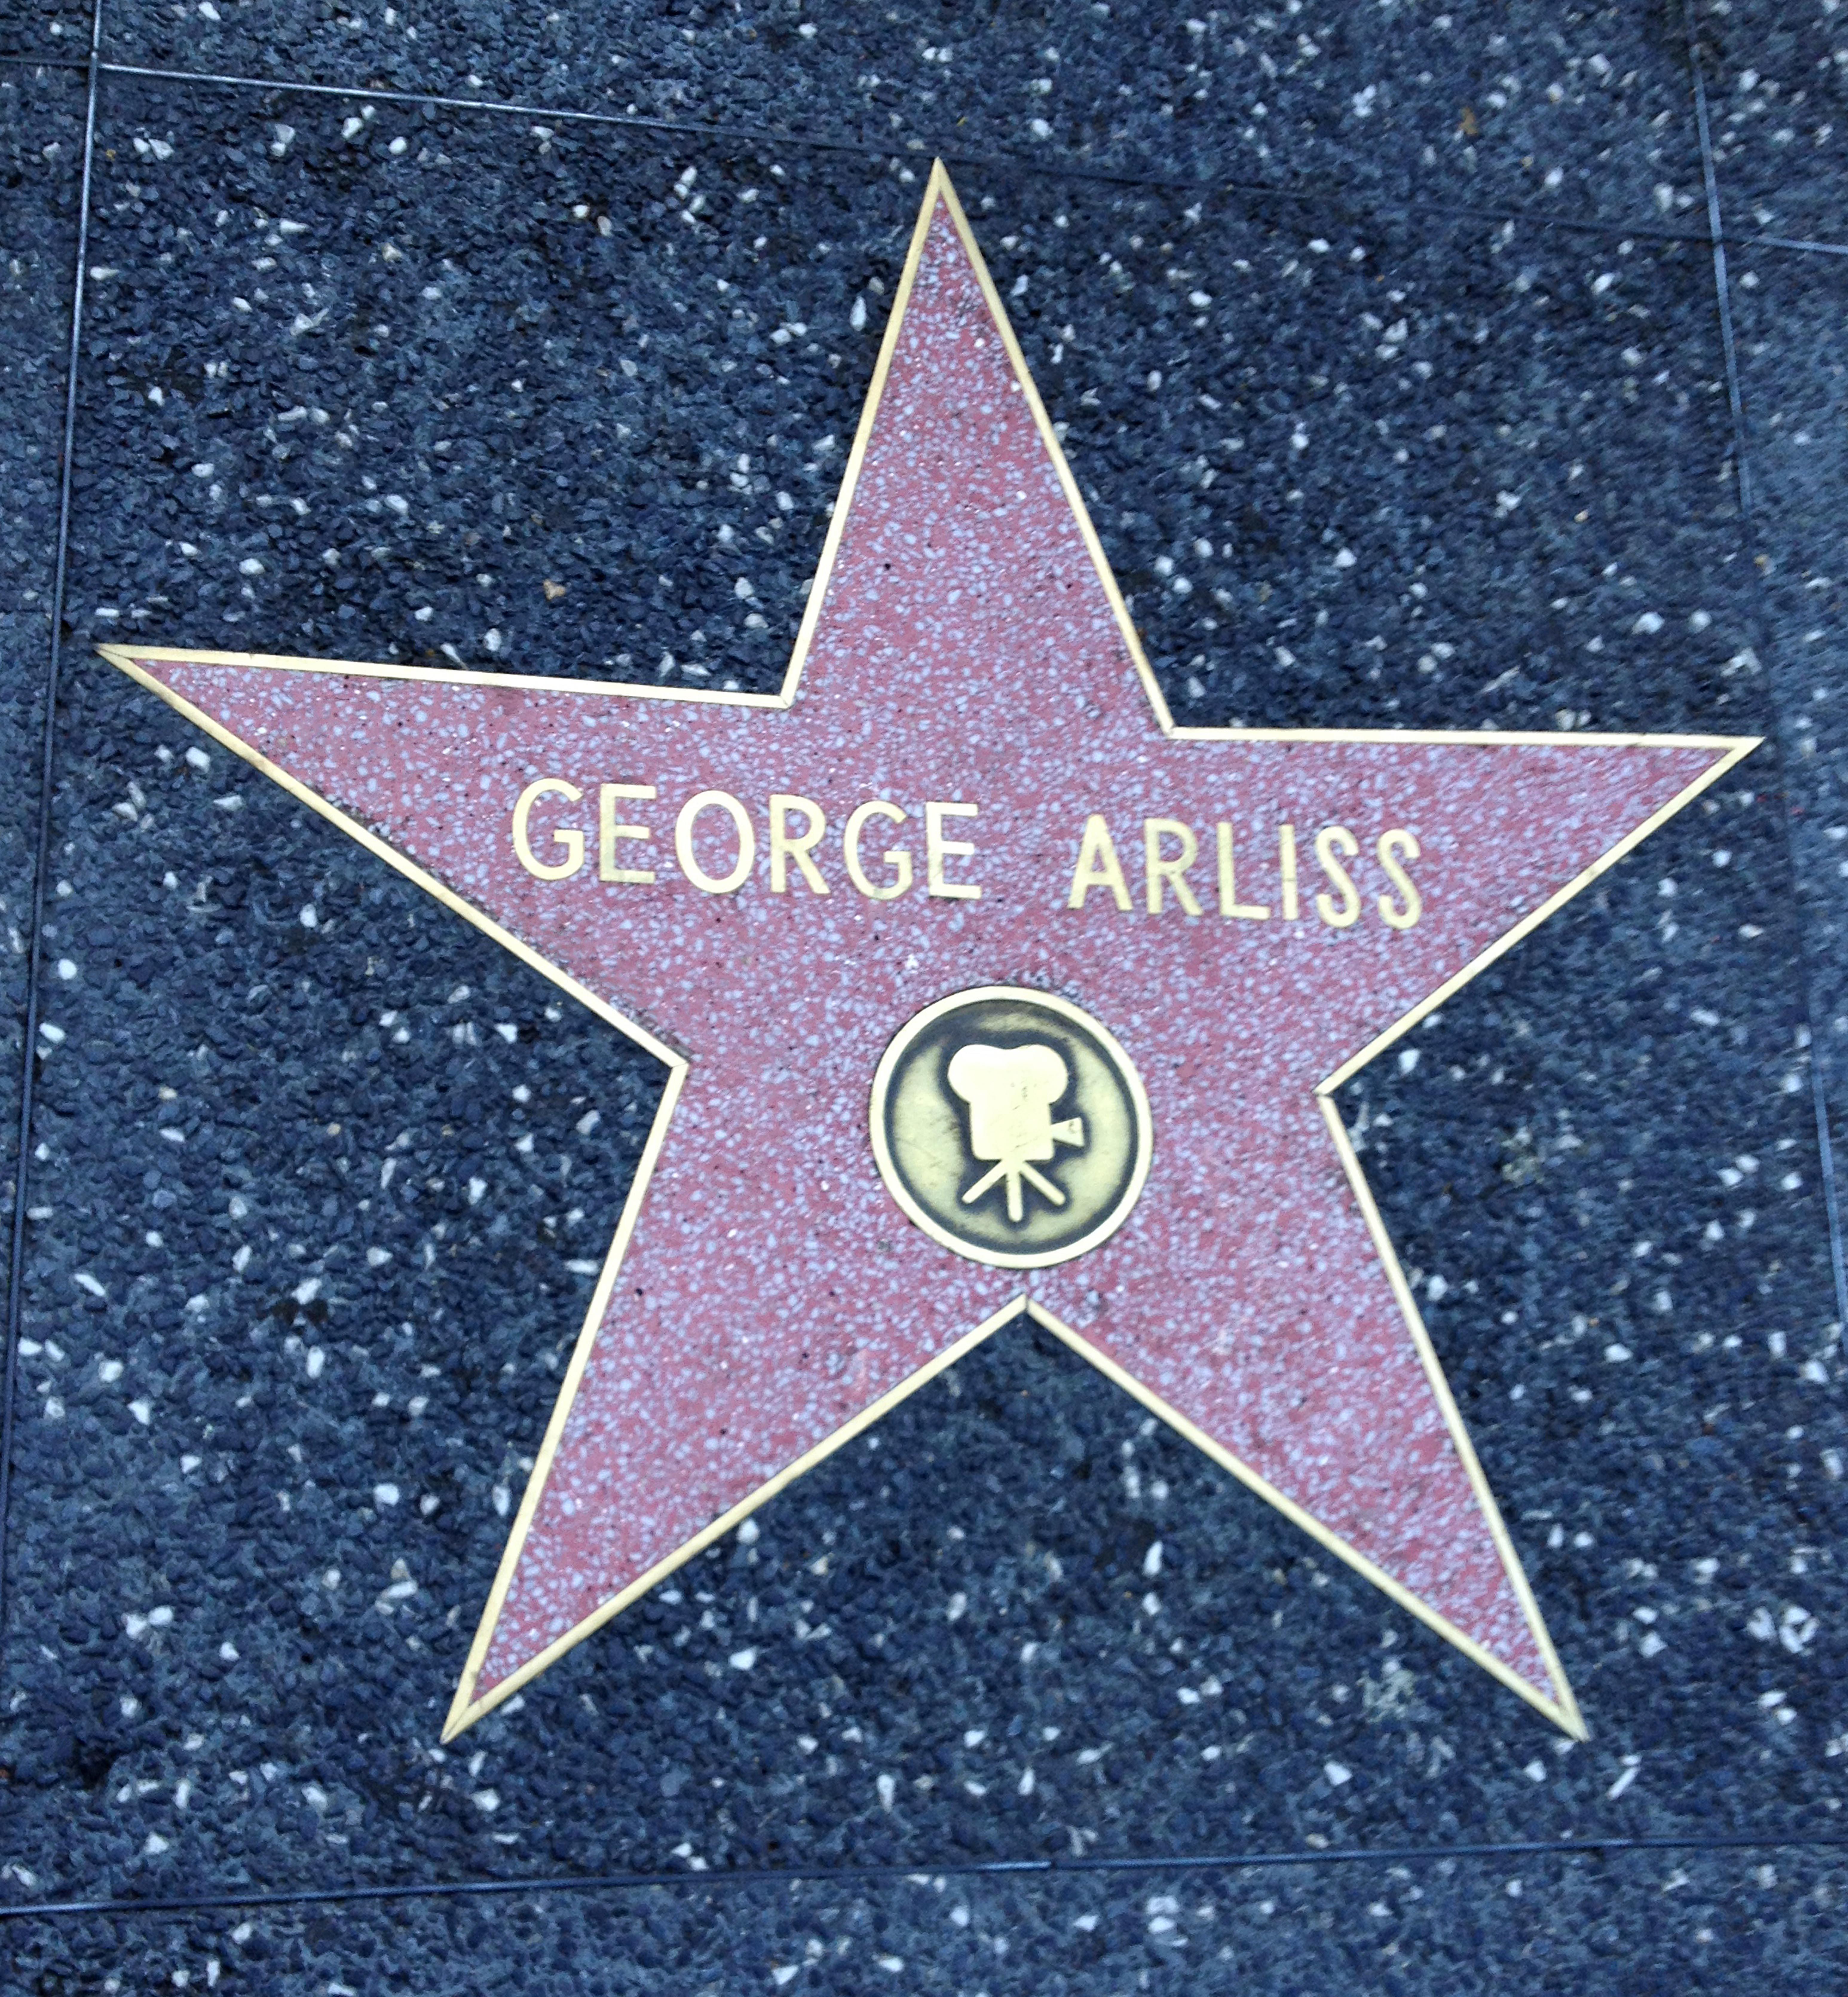 Arliss Star on Walk of Fame LA